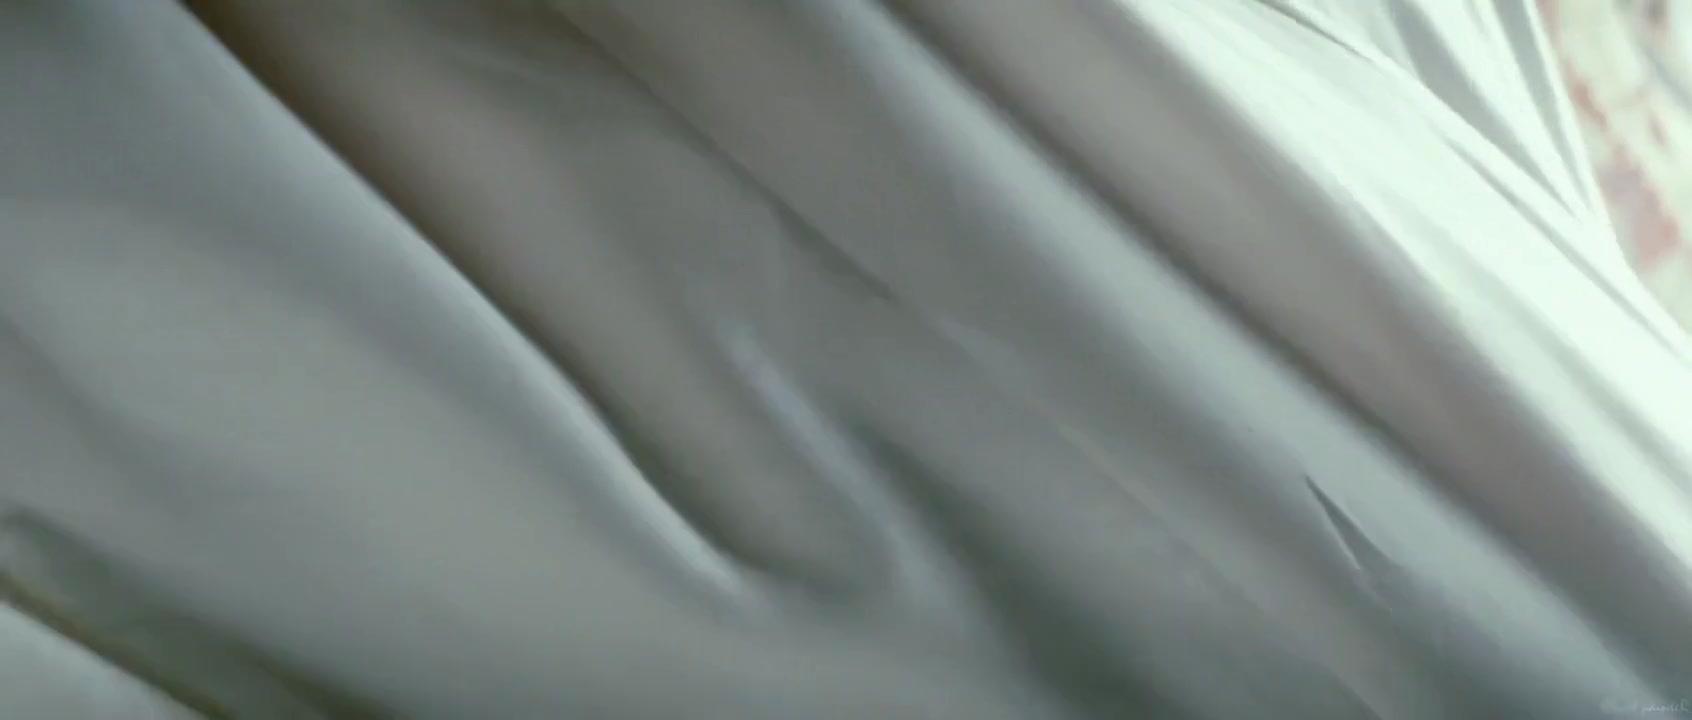 Fucking margo stilley Adult videos